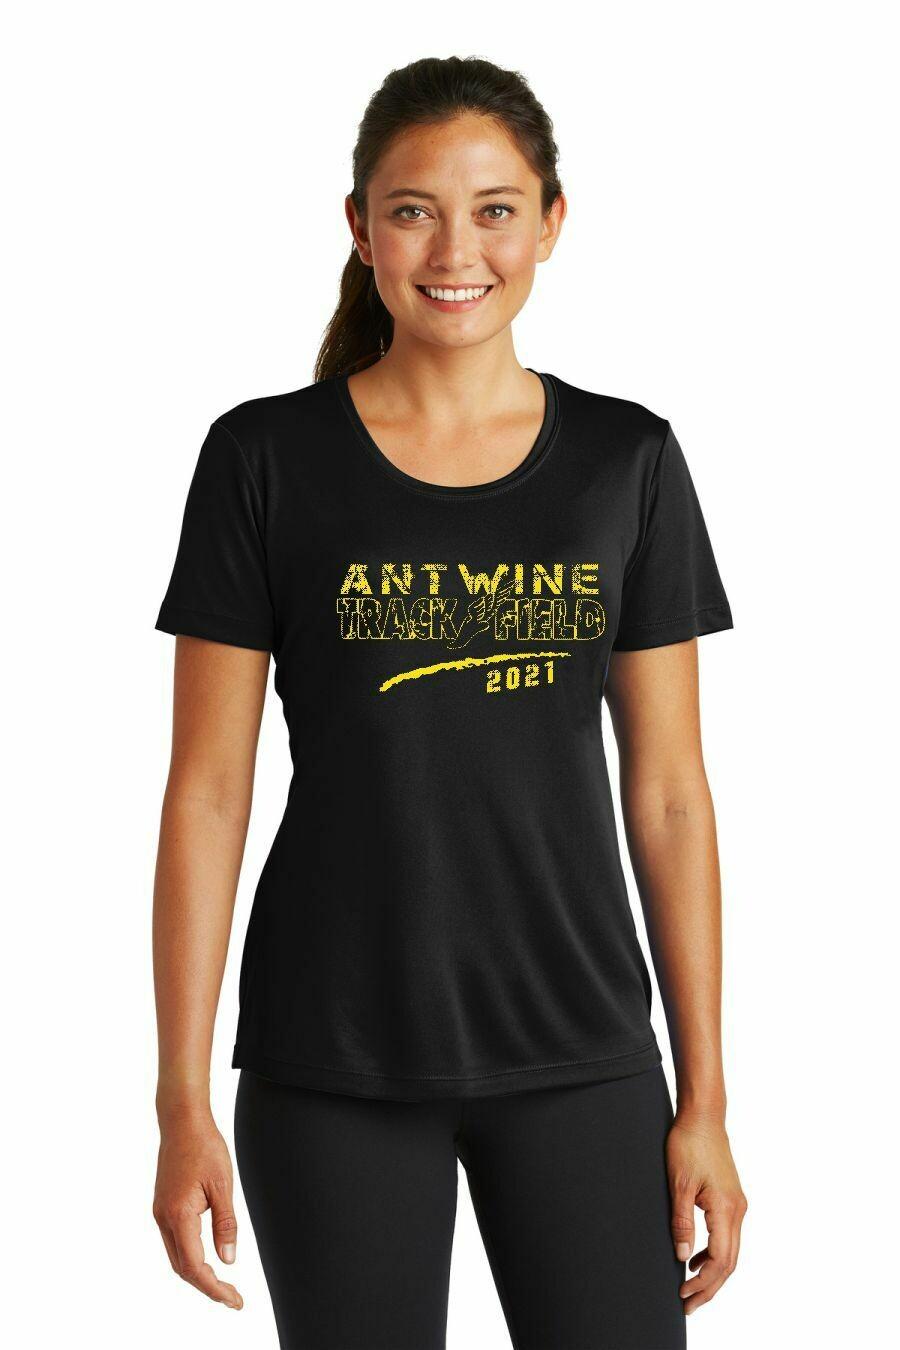 Antwine Ladies' Moisture Wicking T-shirt